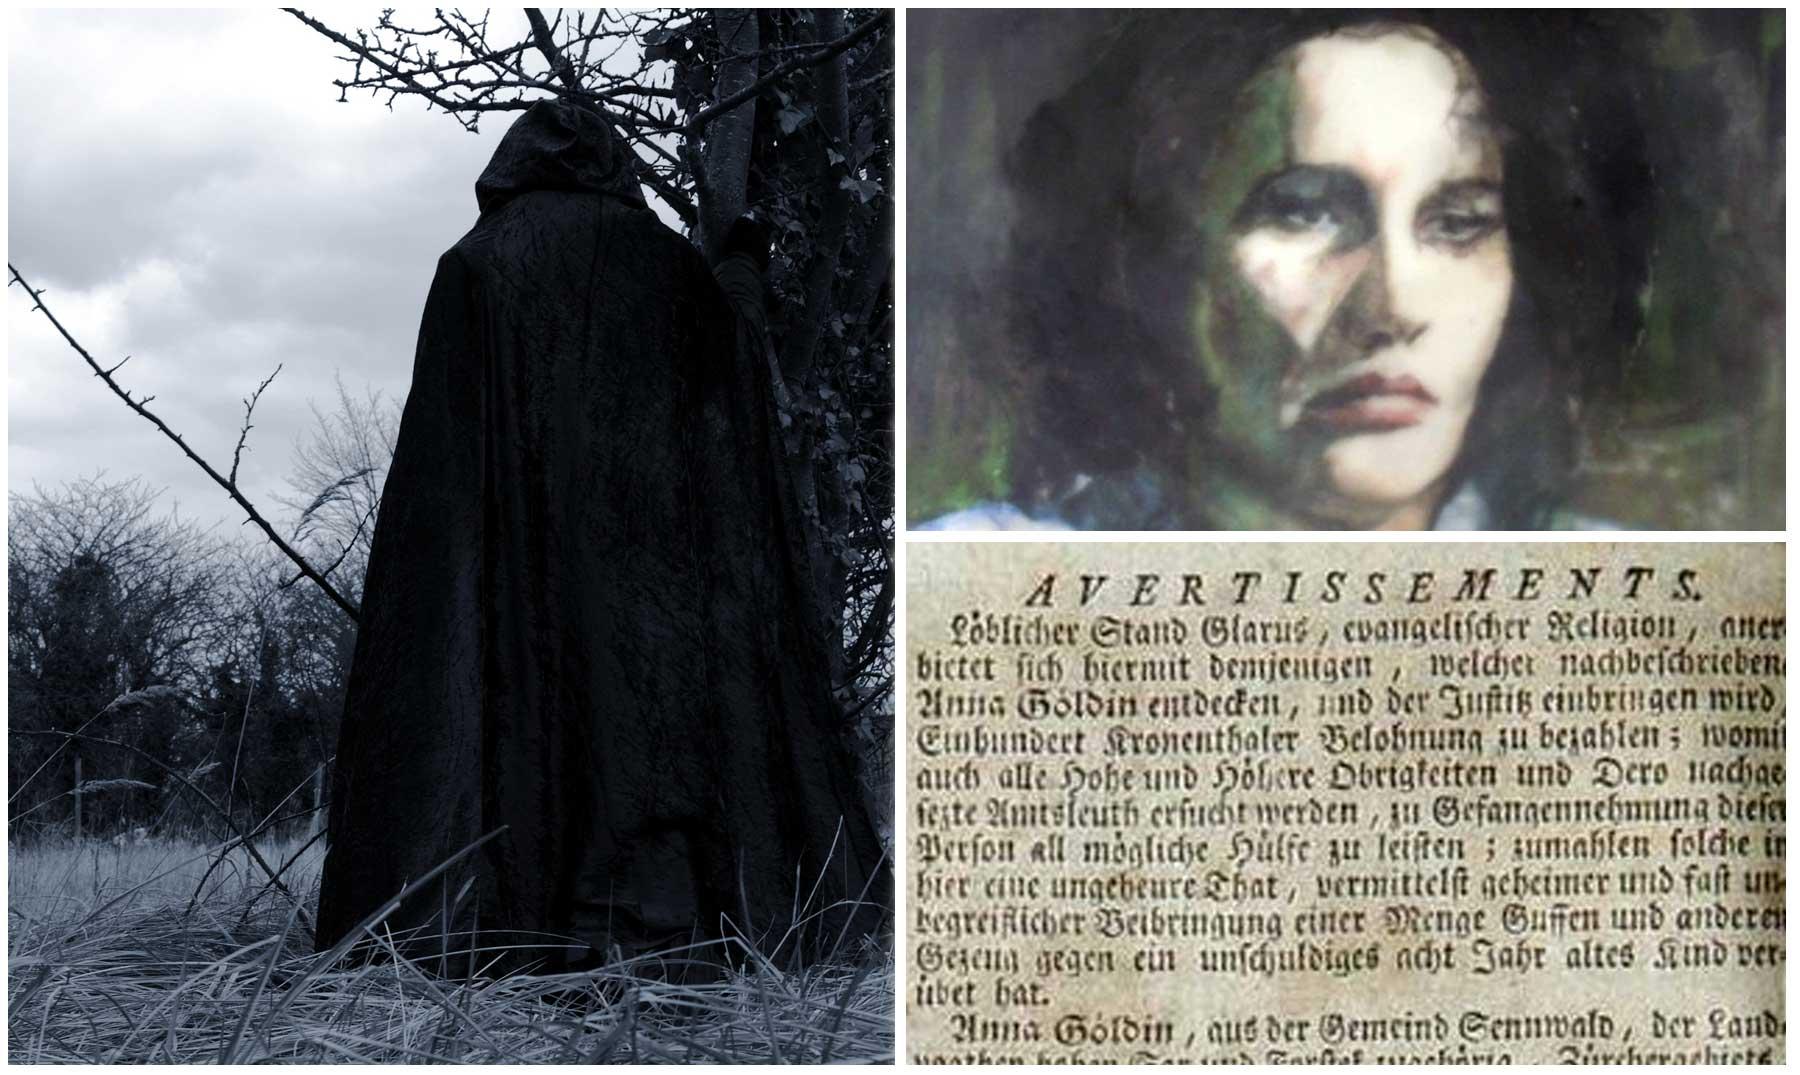 La terrorífica historia de Anna Göldin, la última bruja de Europa